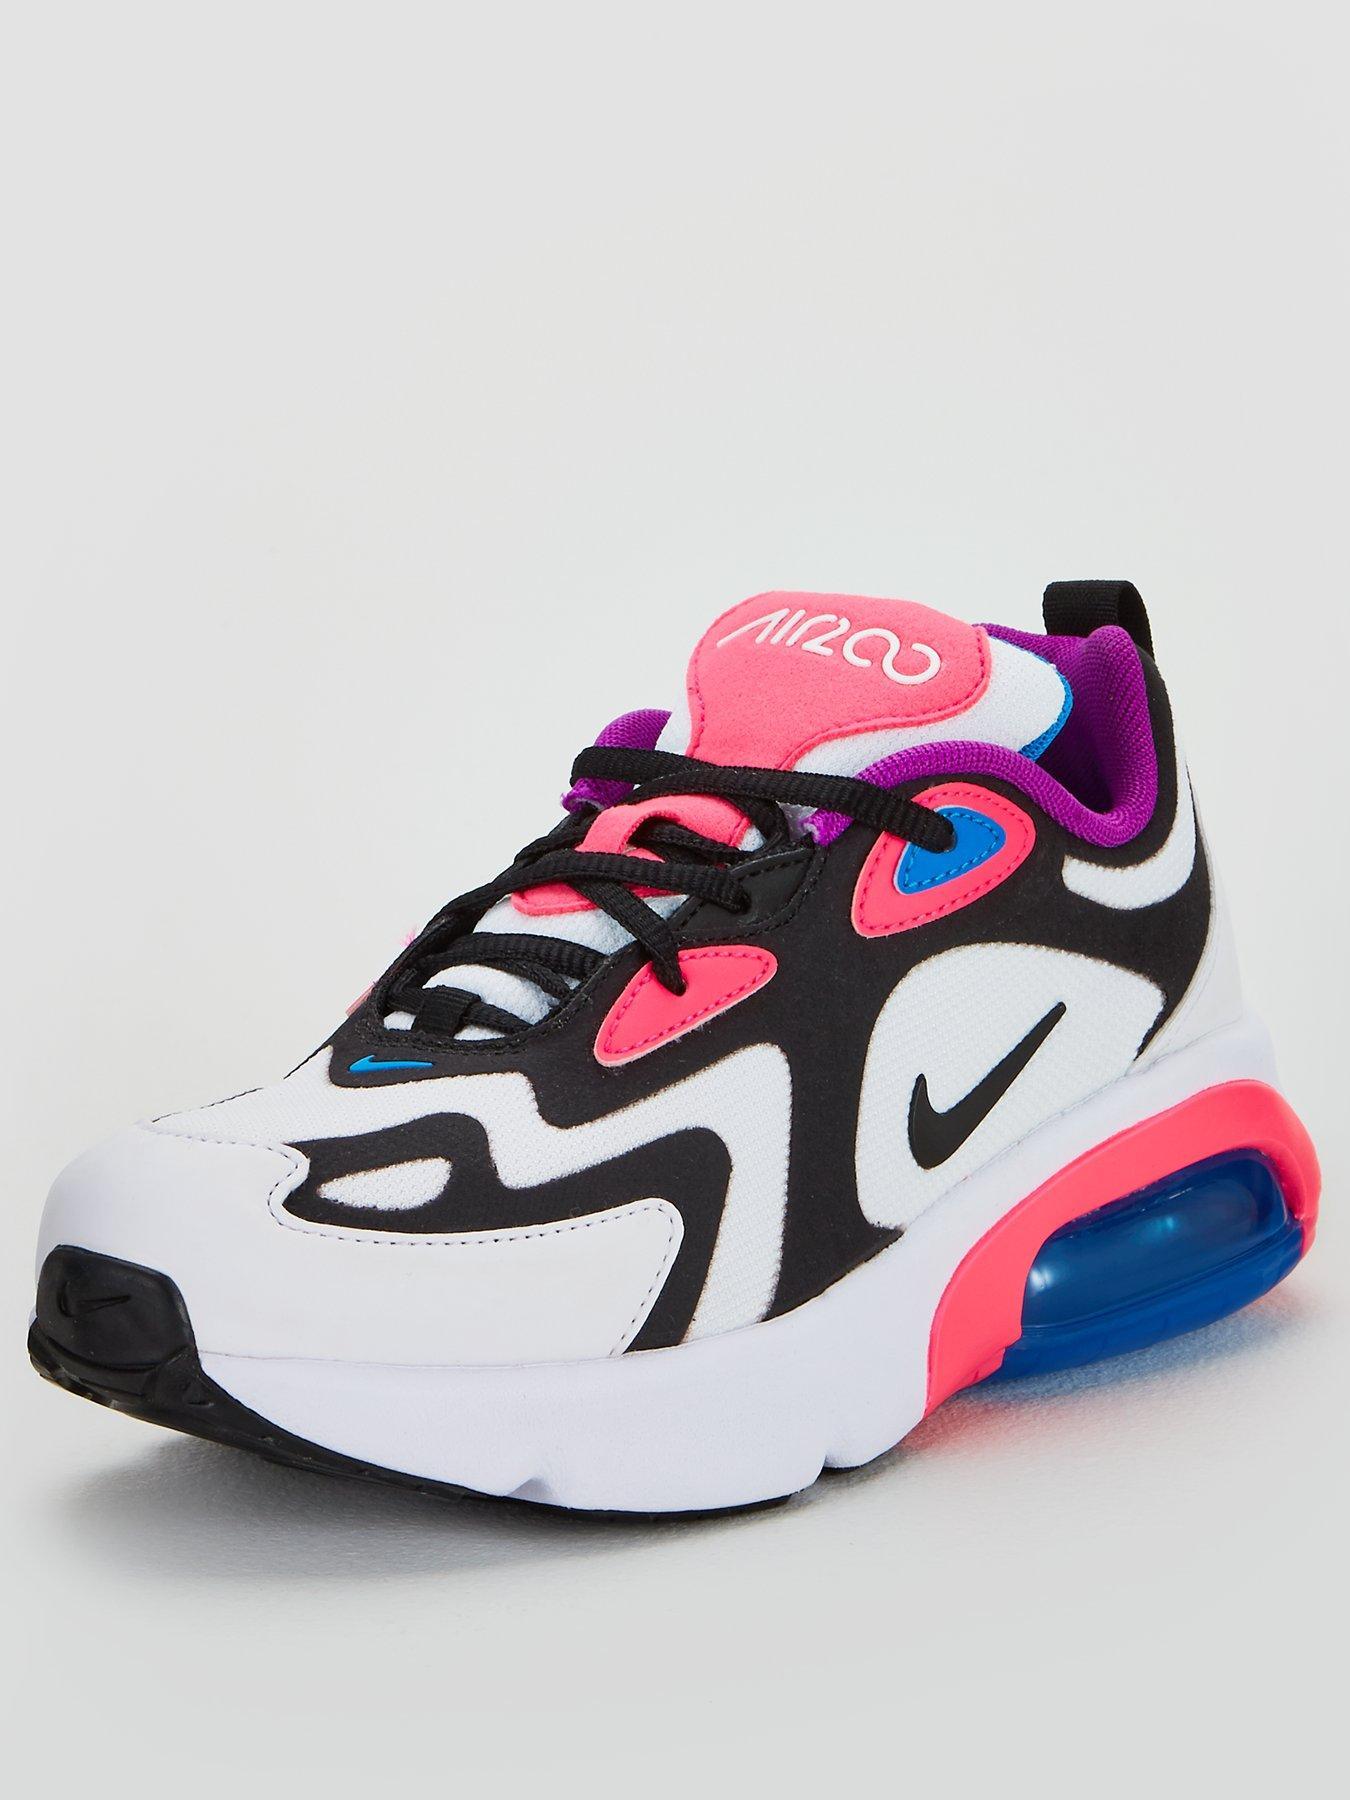 Nike Air Max 95 White Mens UK Size 6 11 Boxed Spring 2016 Colour UK 7